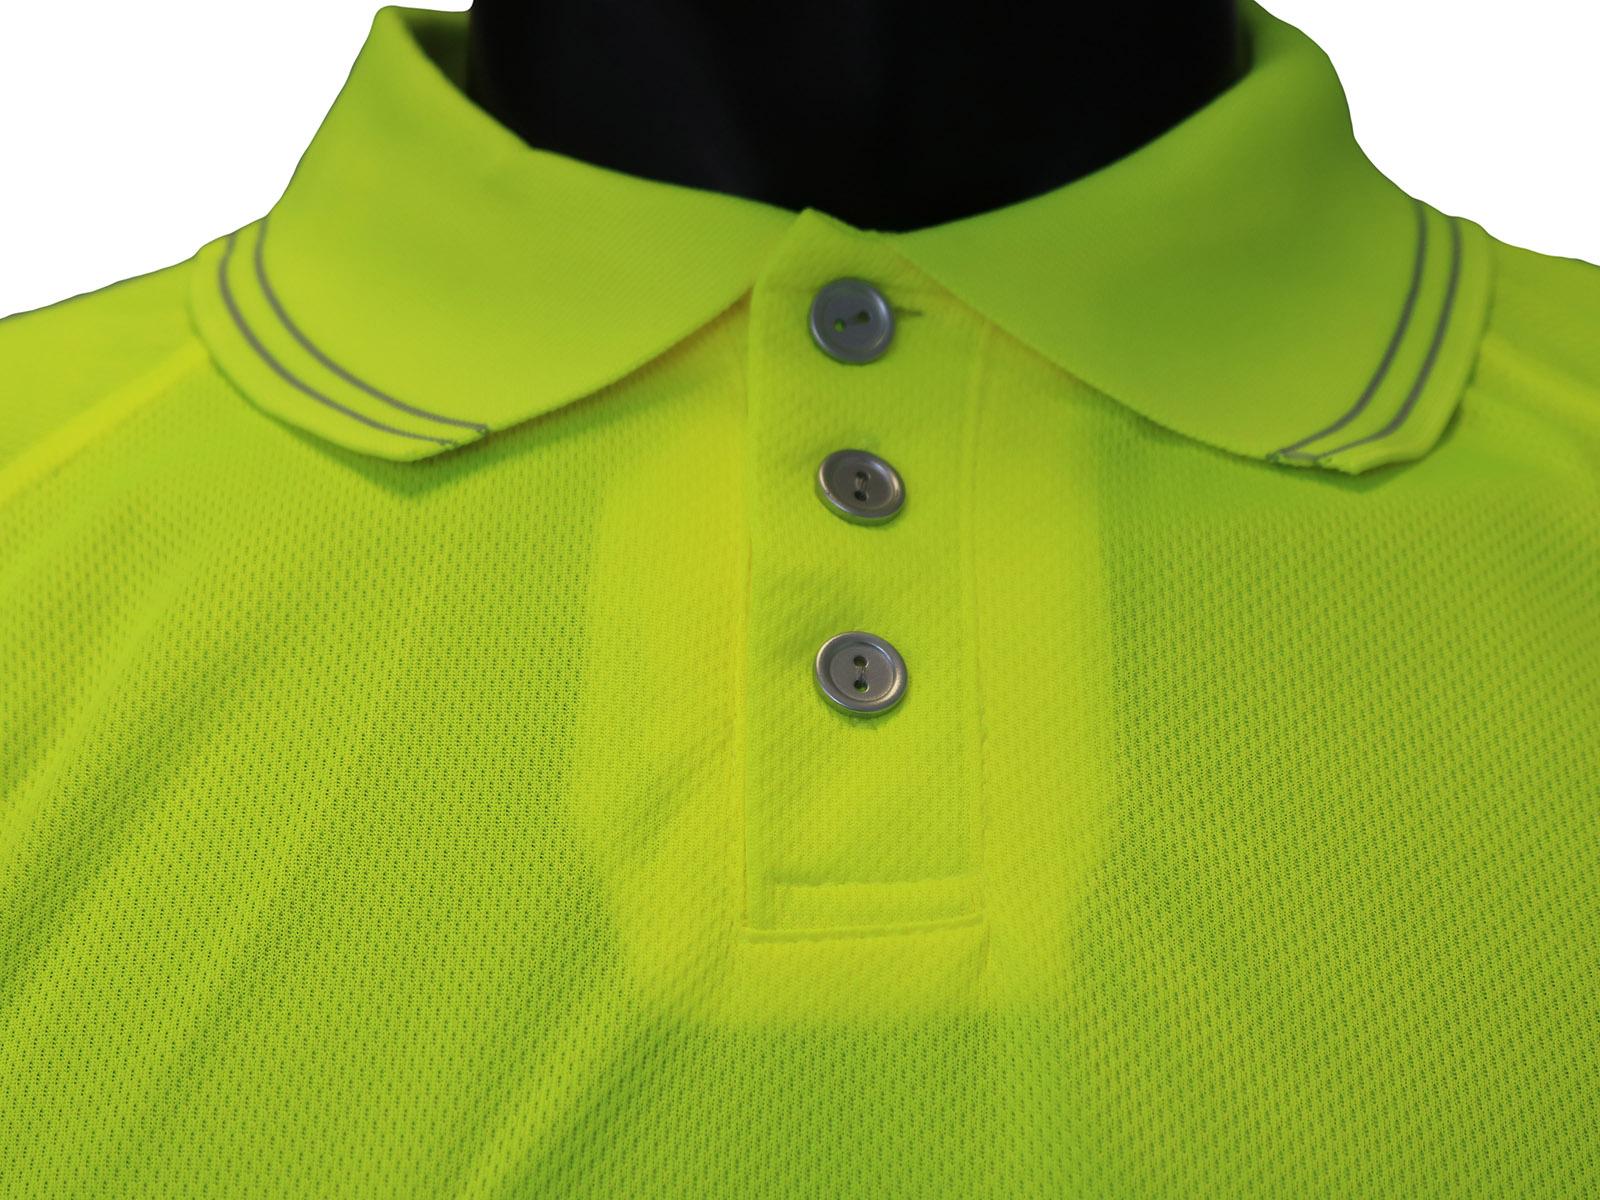 High Vis Short Sleeve Yellow Polo Shirt w/ Mobile Phone Pocket - 2